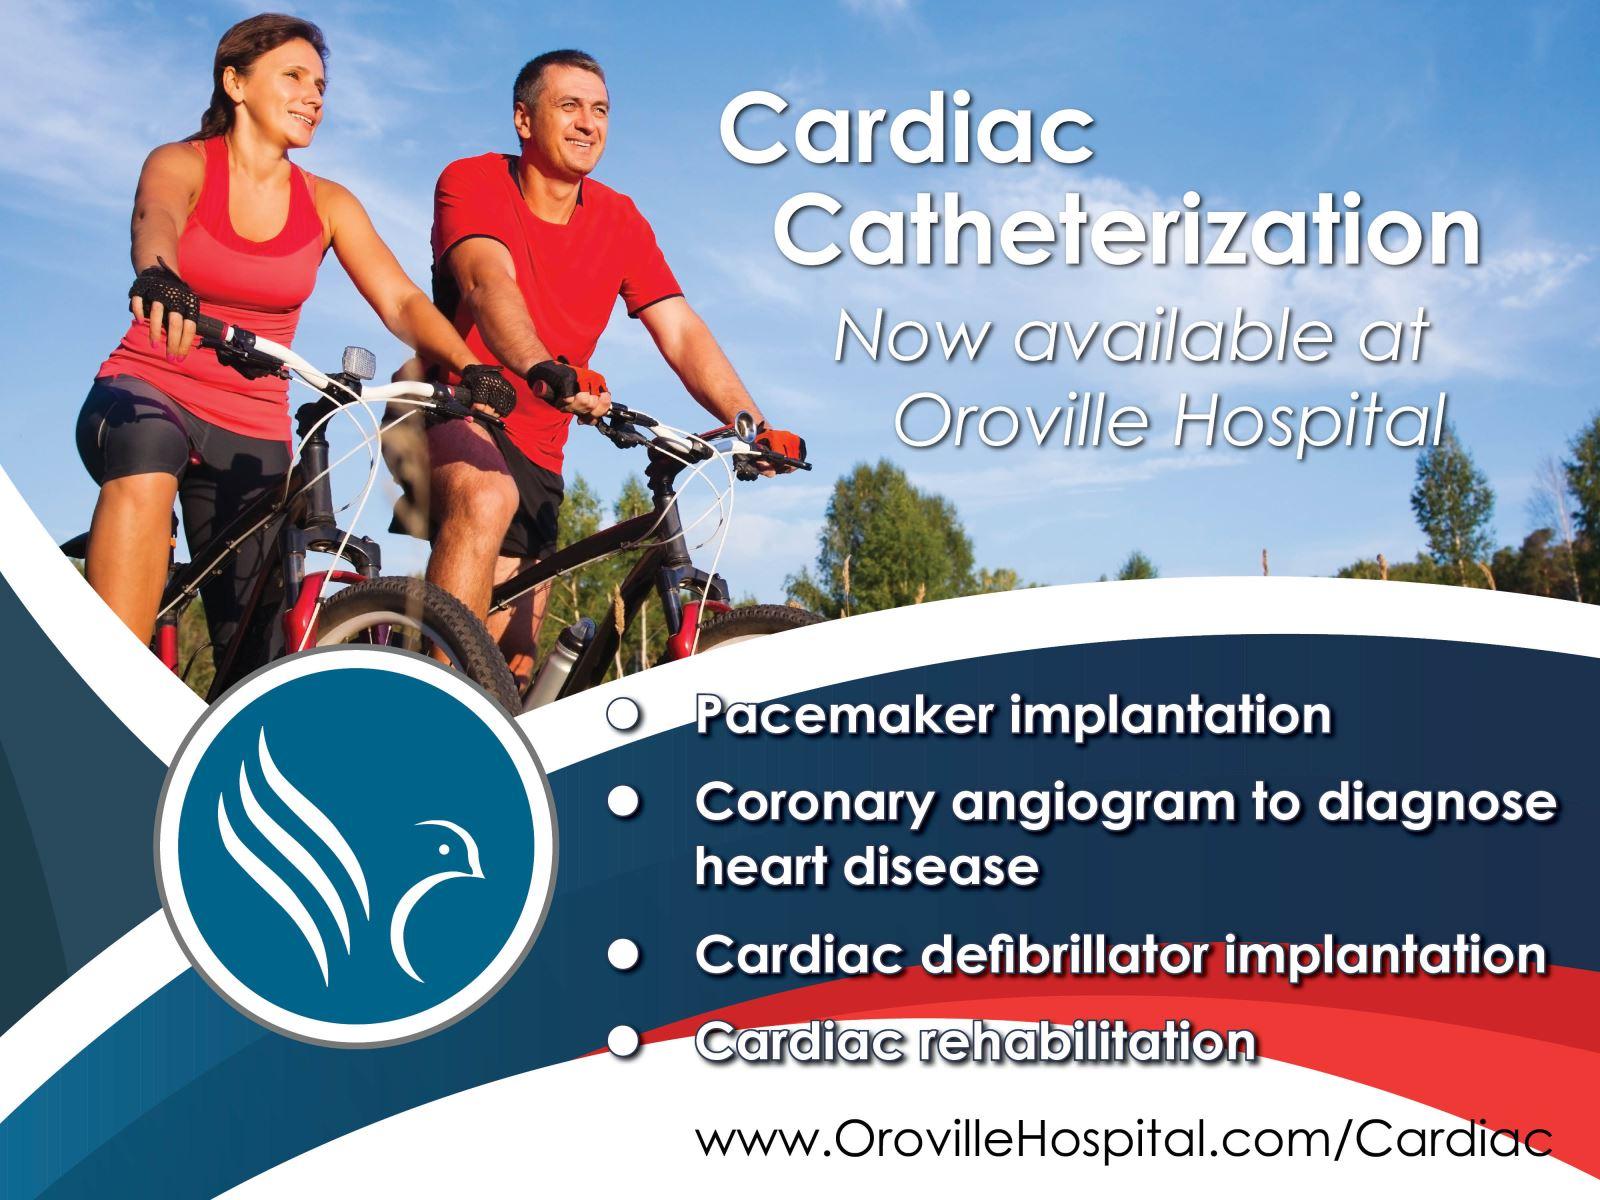 Cardiac Catheterization - Now Available! - News Article